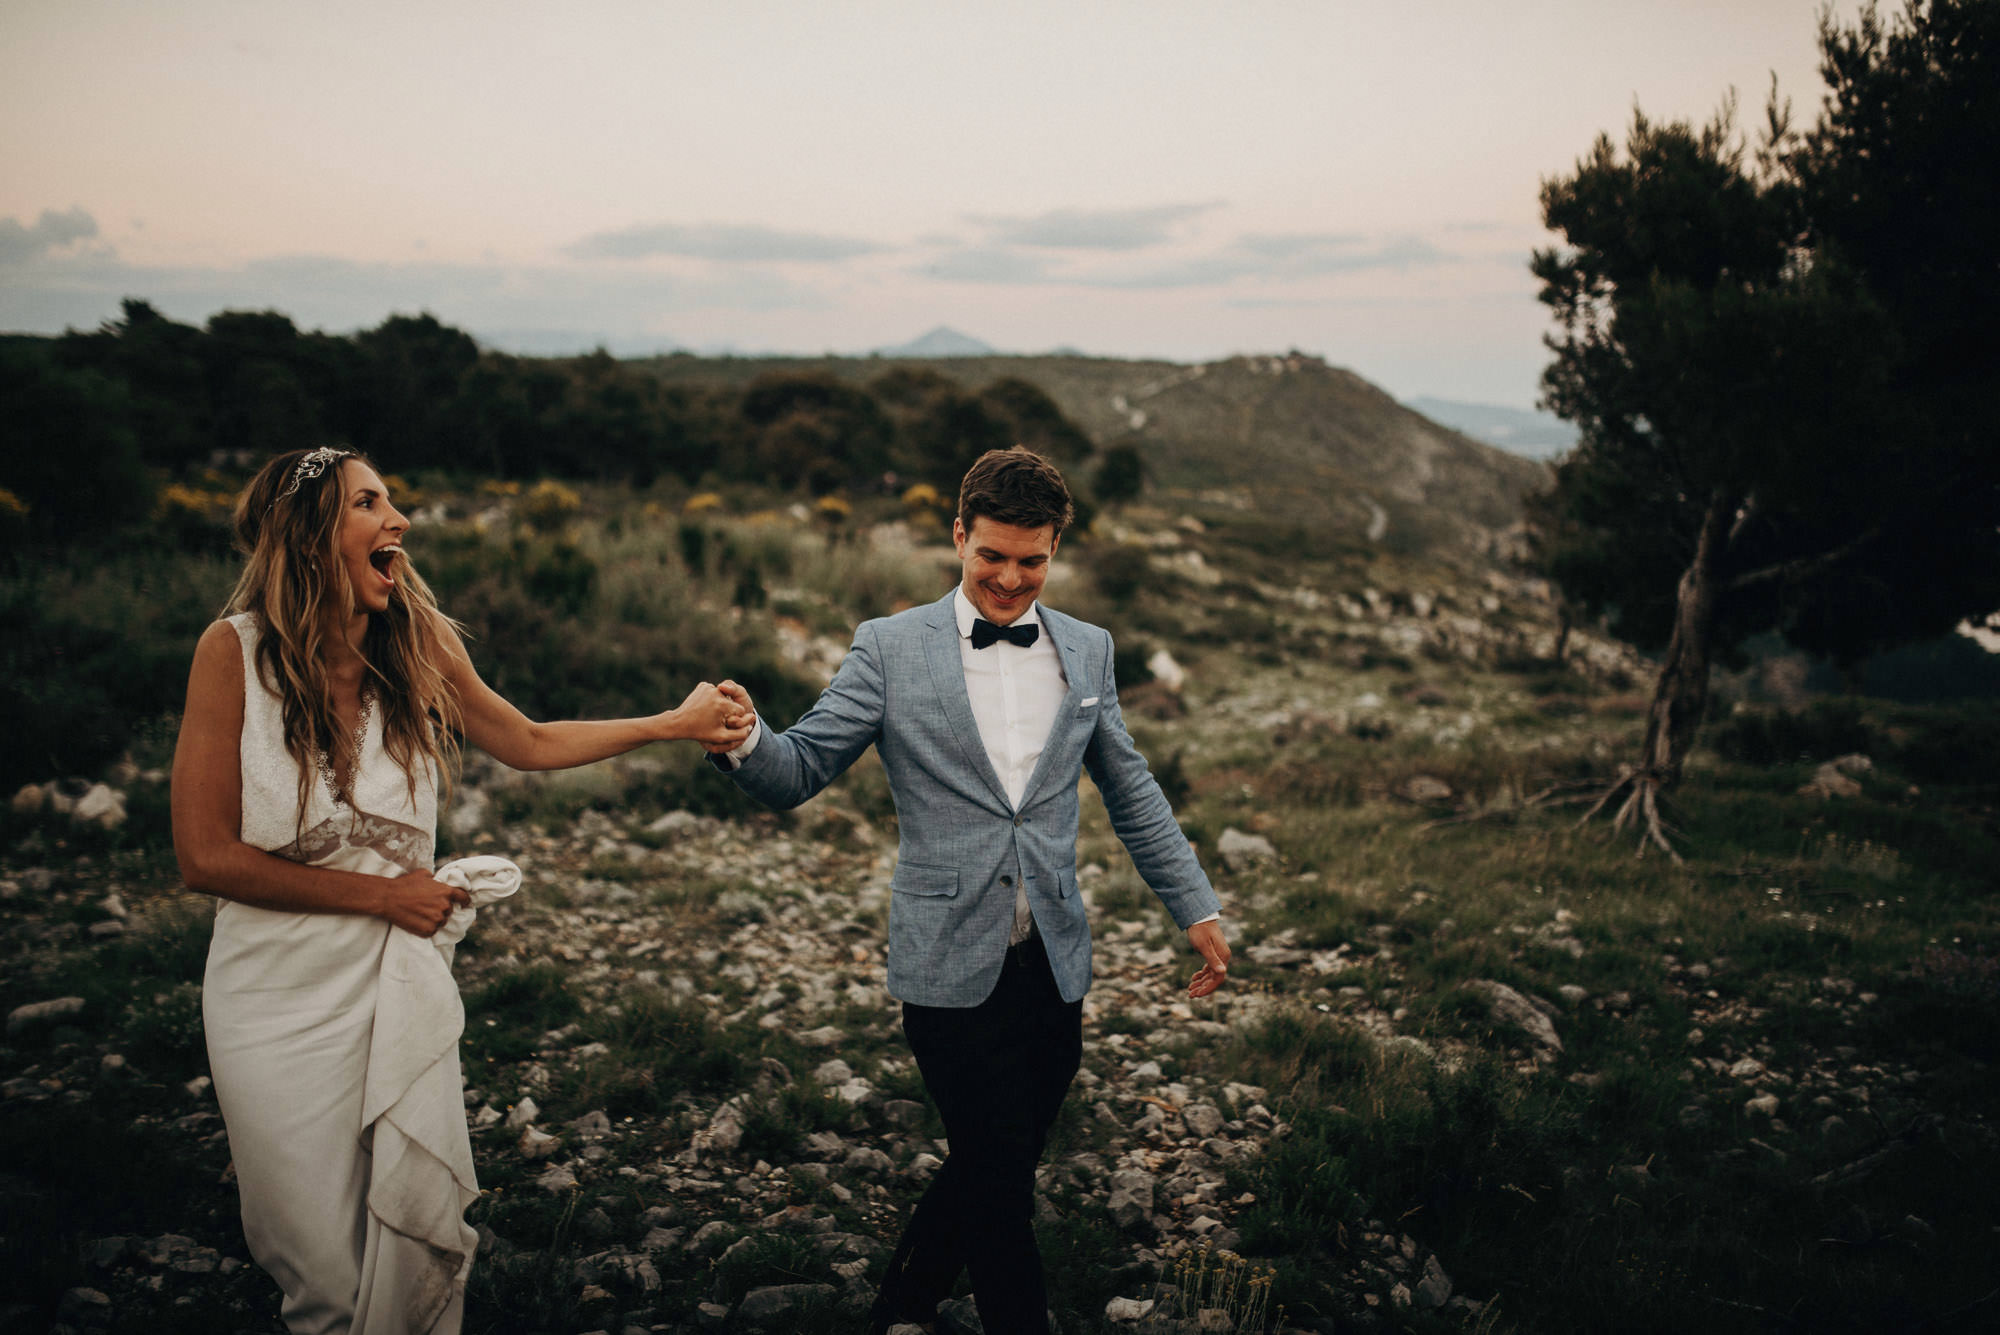 dubrovnik_croatia_wedding_photographer-jere_satamo-destination_weddings-119-web.jpg